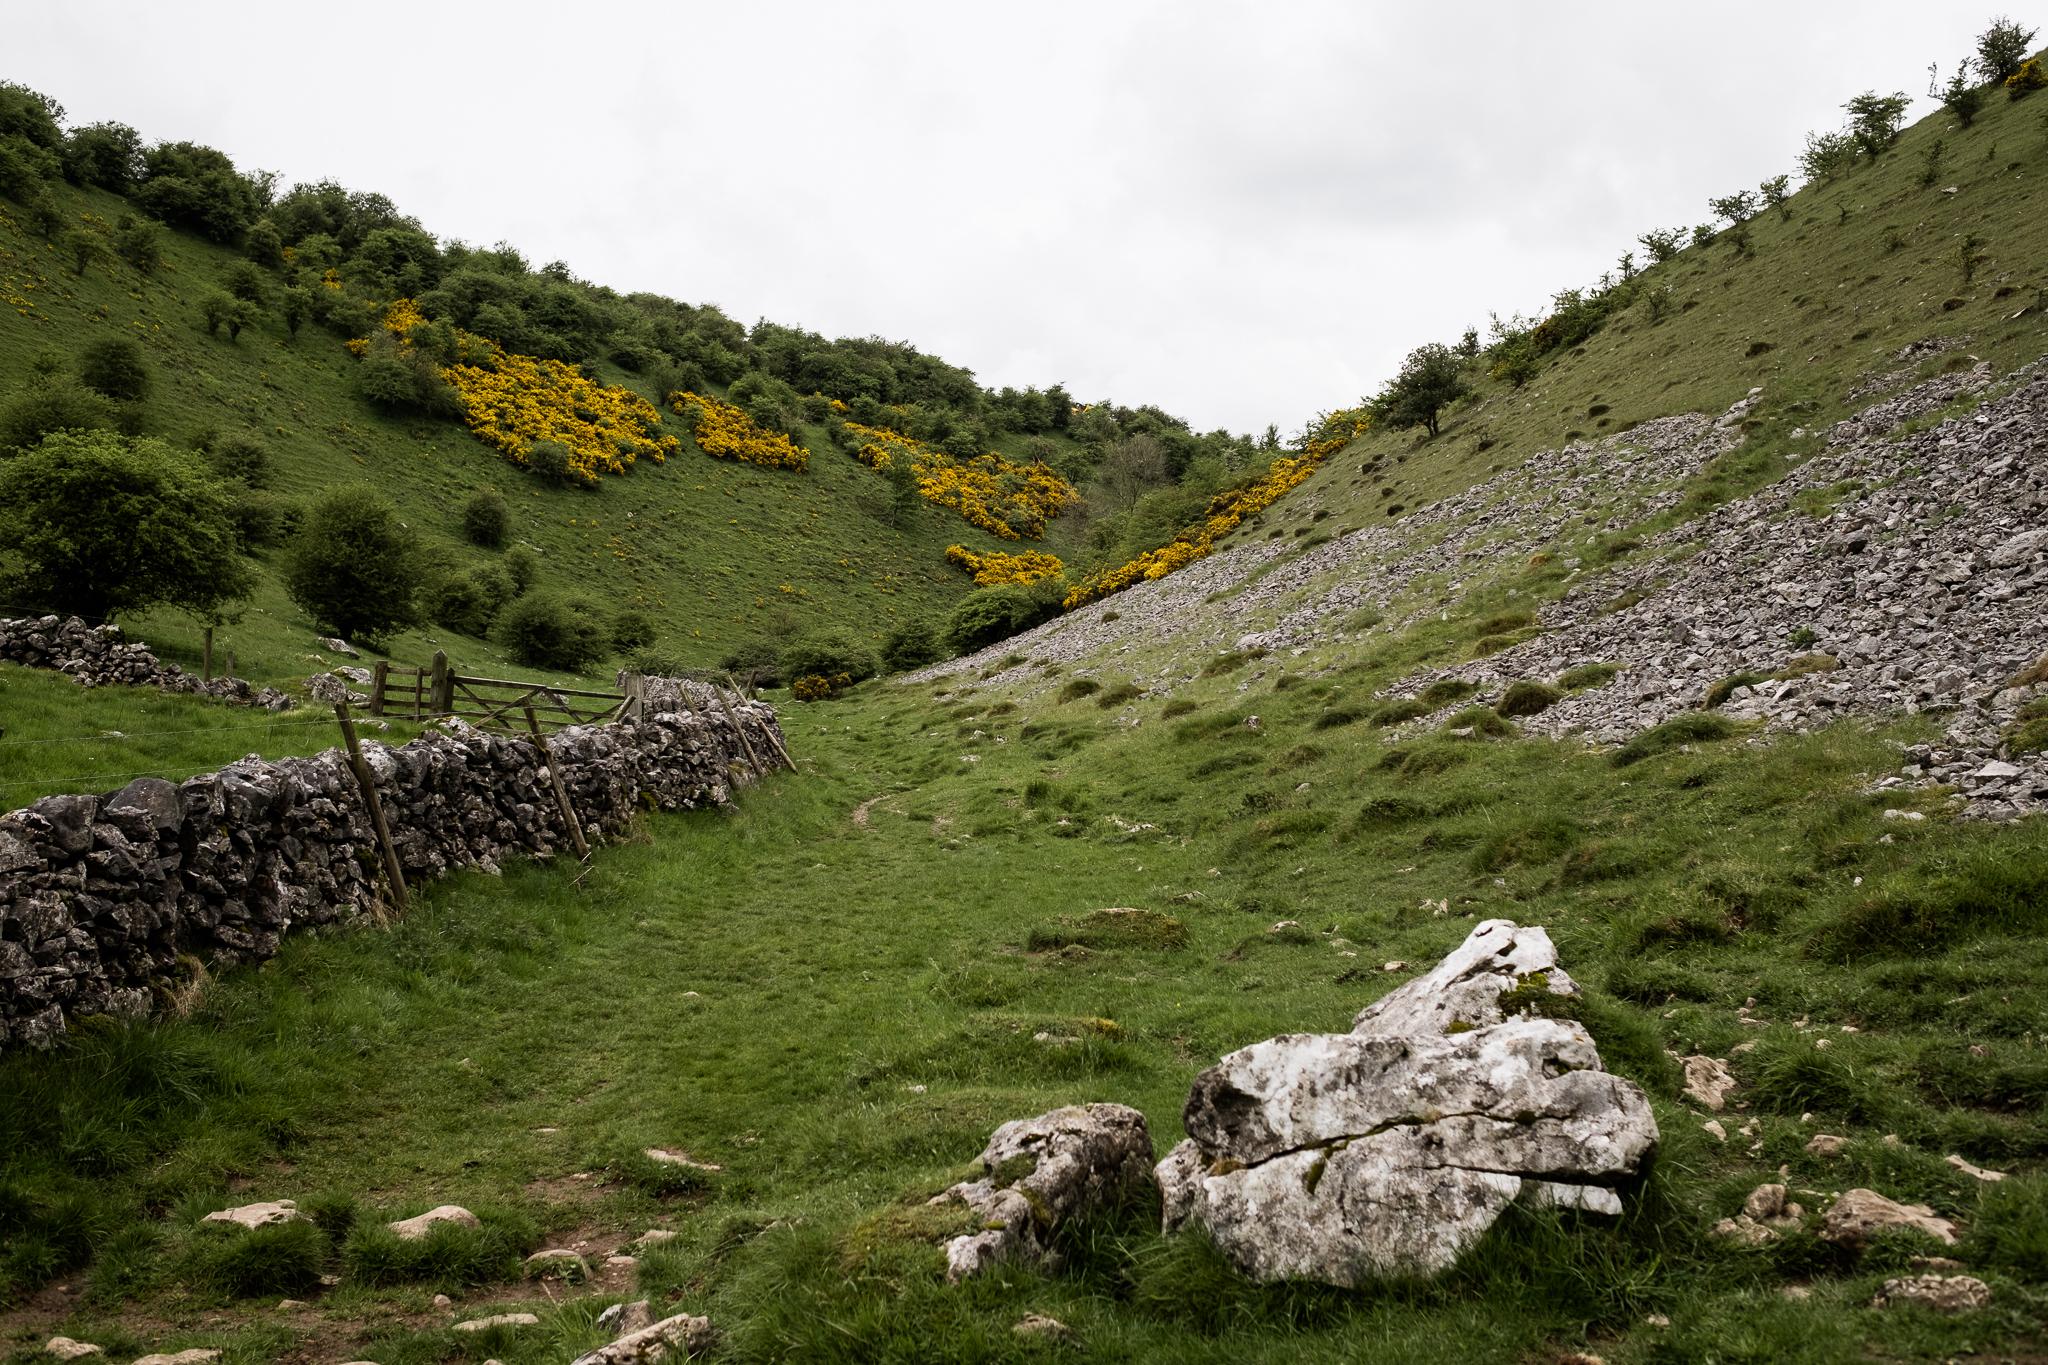 05.19.2017 The Photowalk Network Get Some Fresh Air Photowalk at Hartington and Biggin, Staffordshire Peak District National Trust-24.jpg